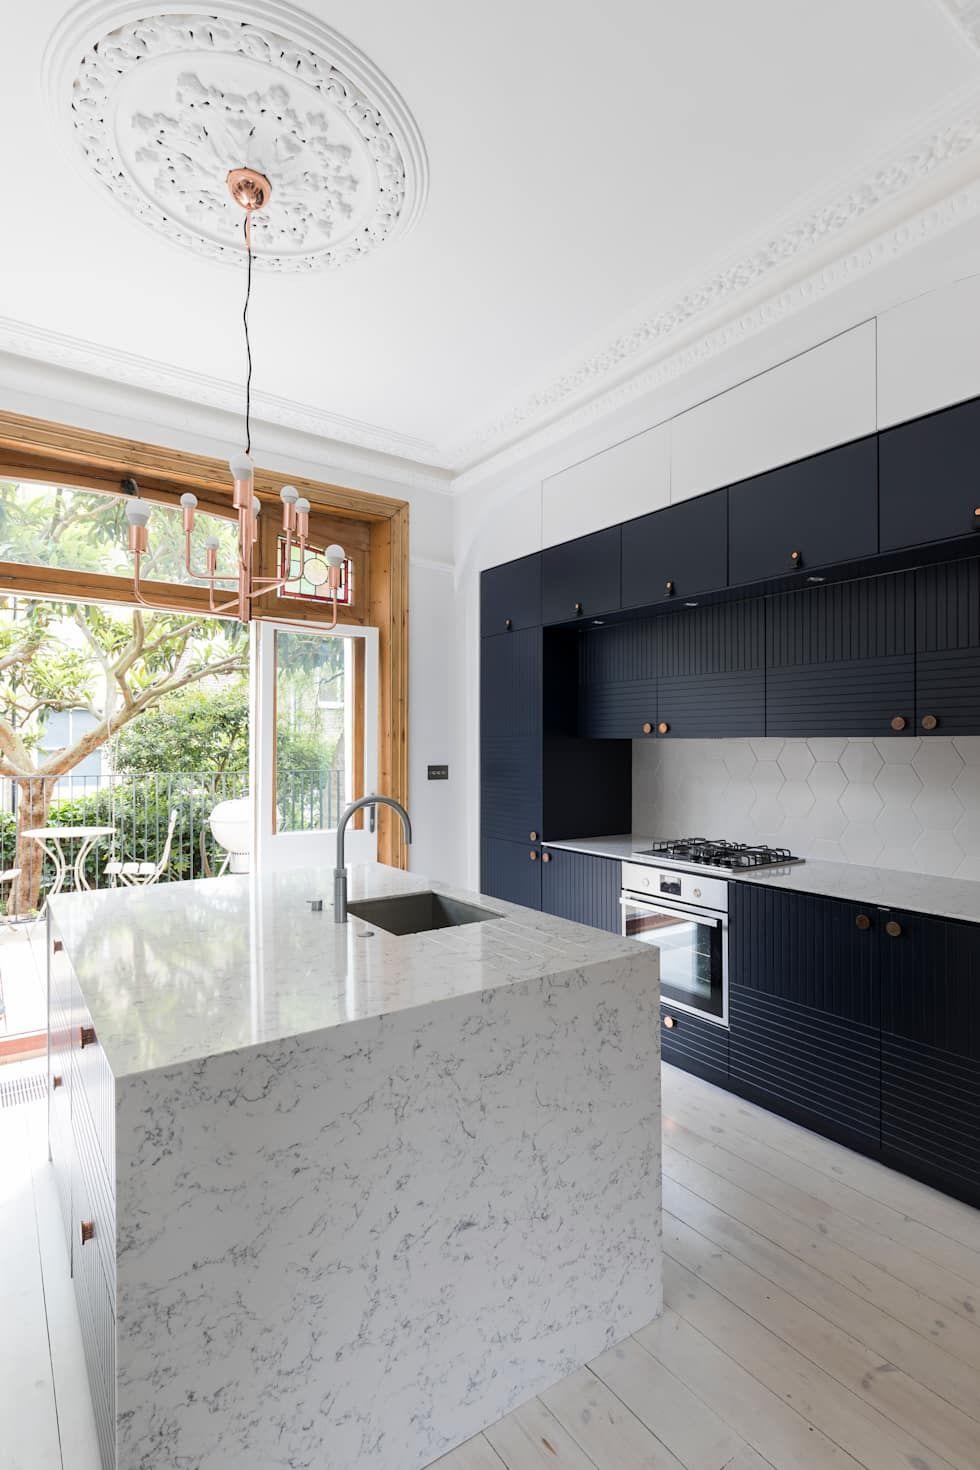 Interior design ideas redecorating u remodeling photos extensions